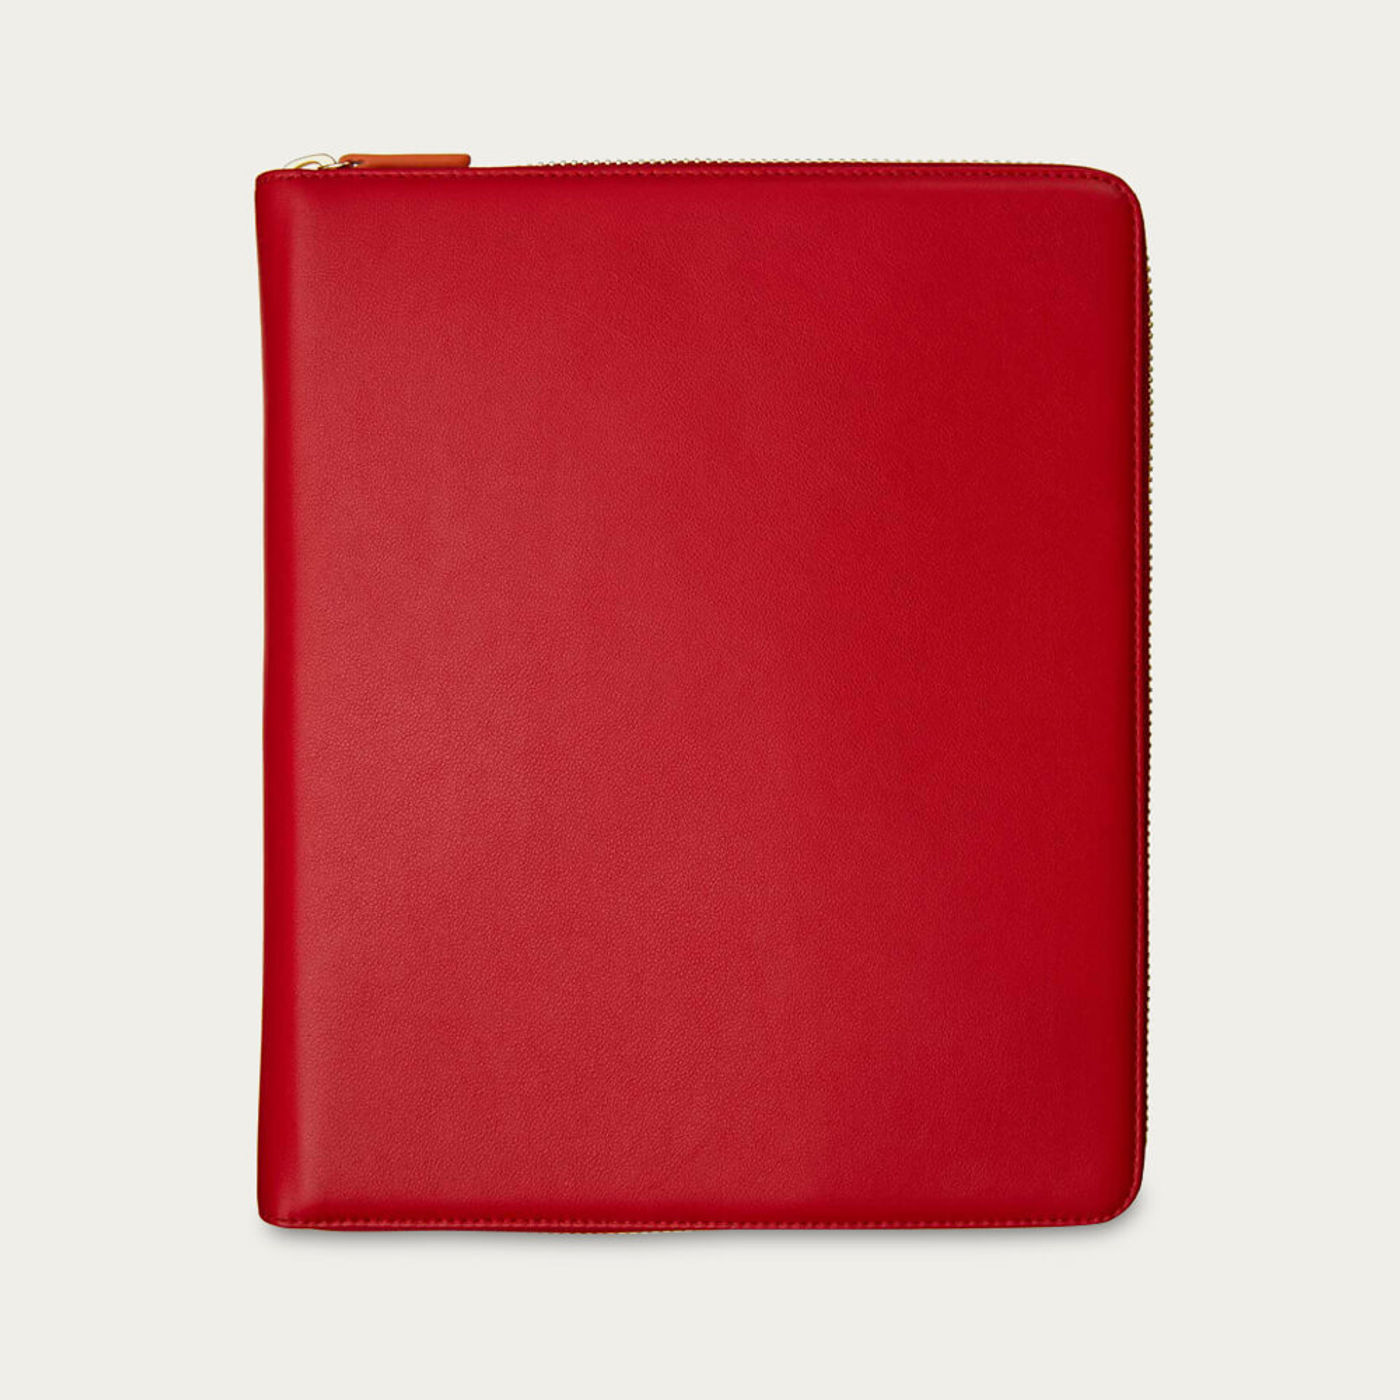 Ridge Red The World Class Leather Tech Case | Bombinate